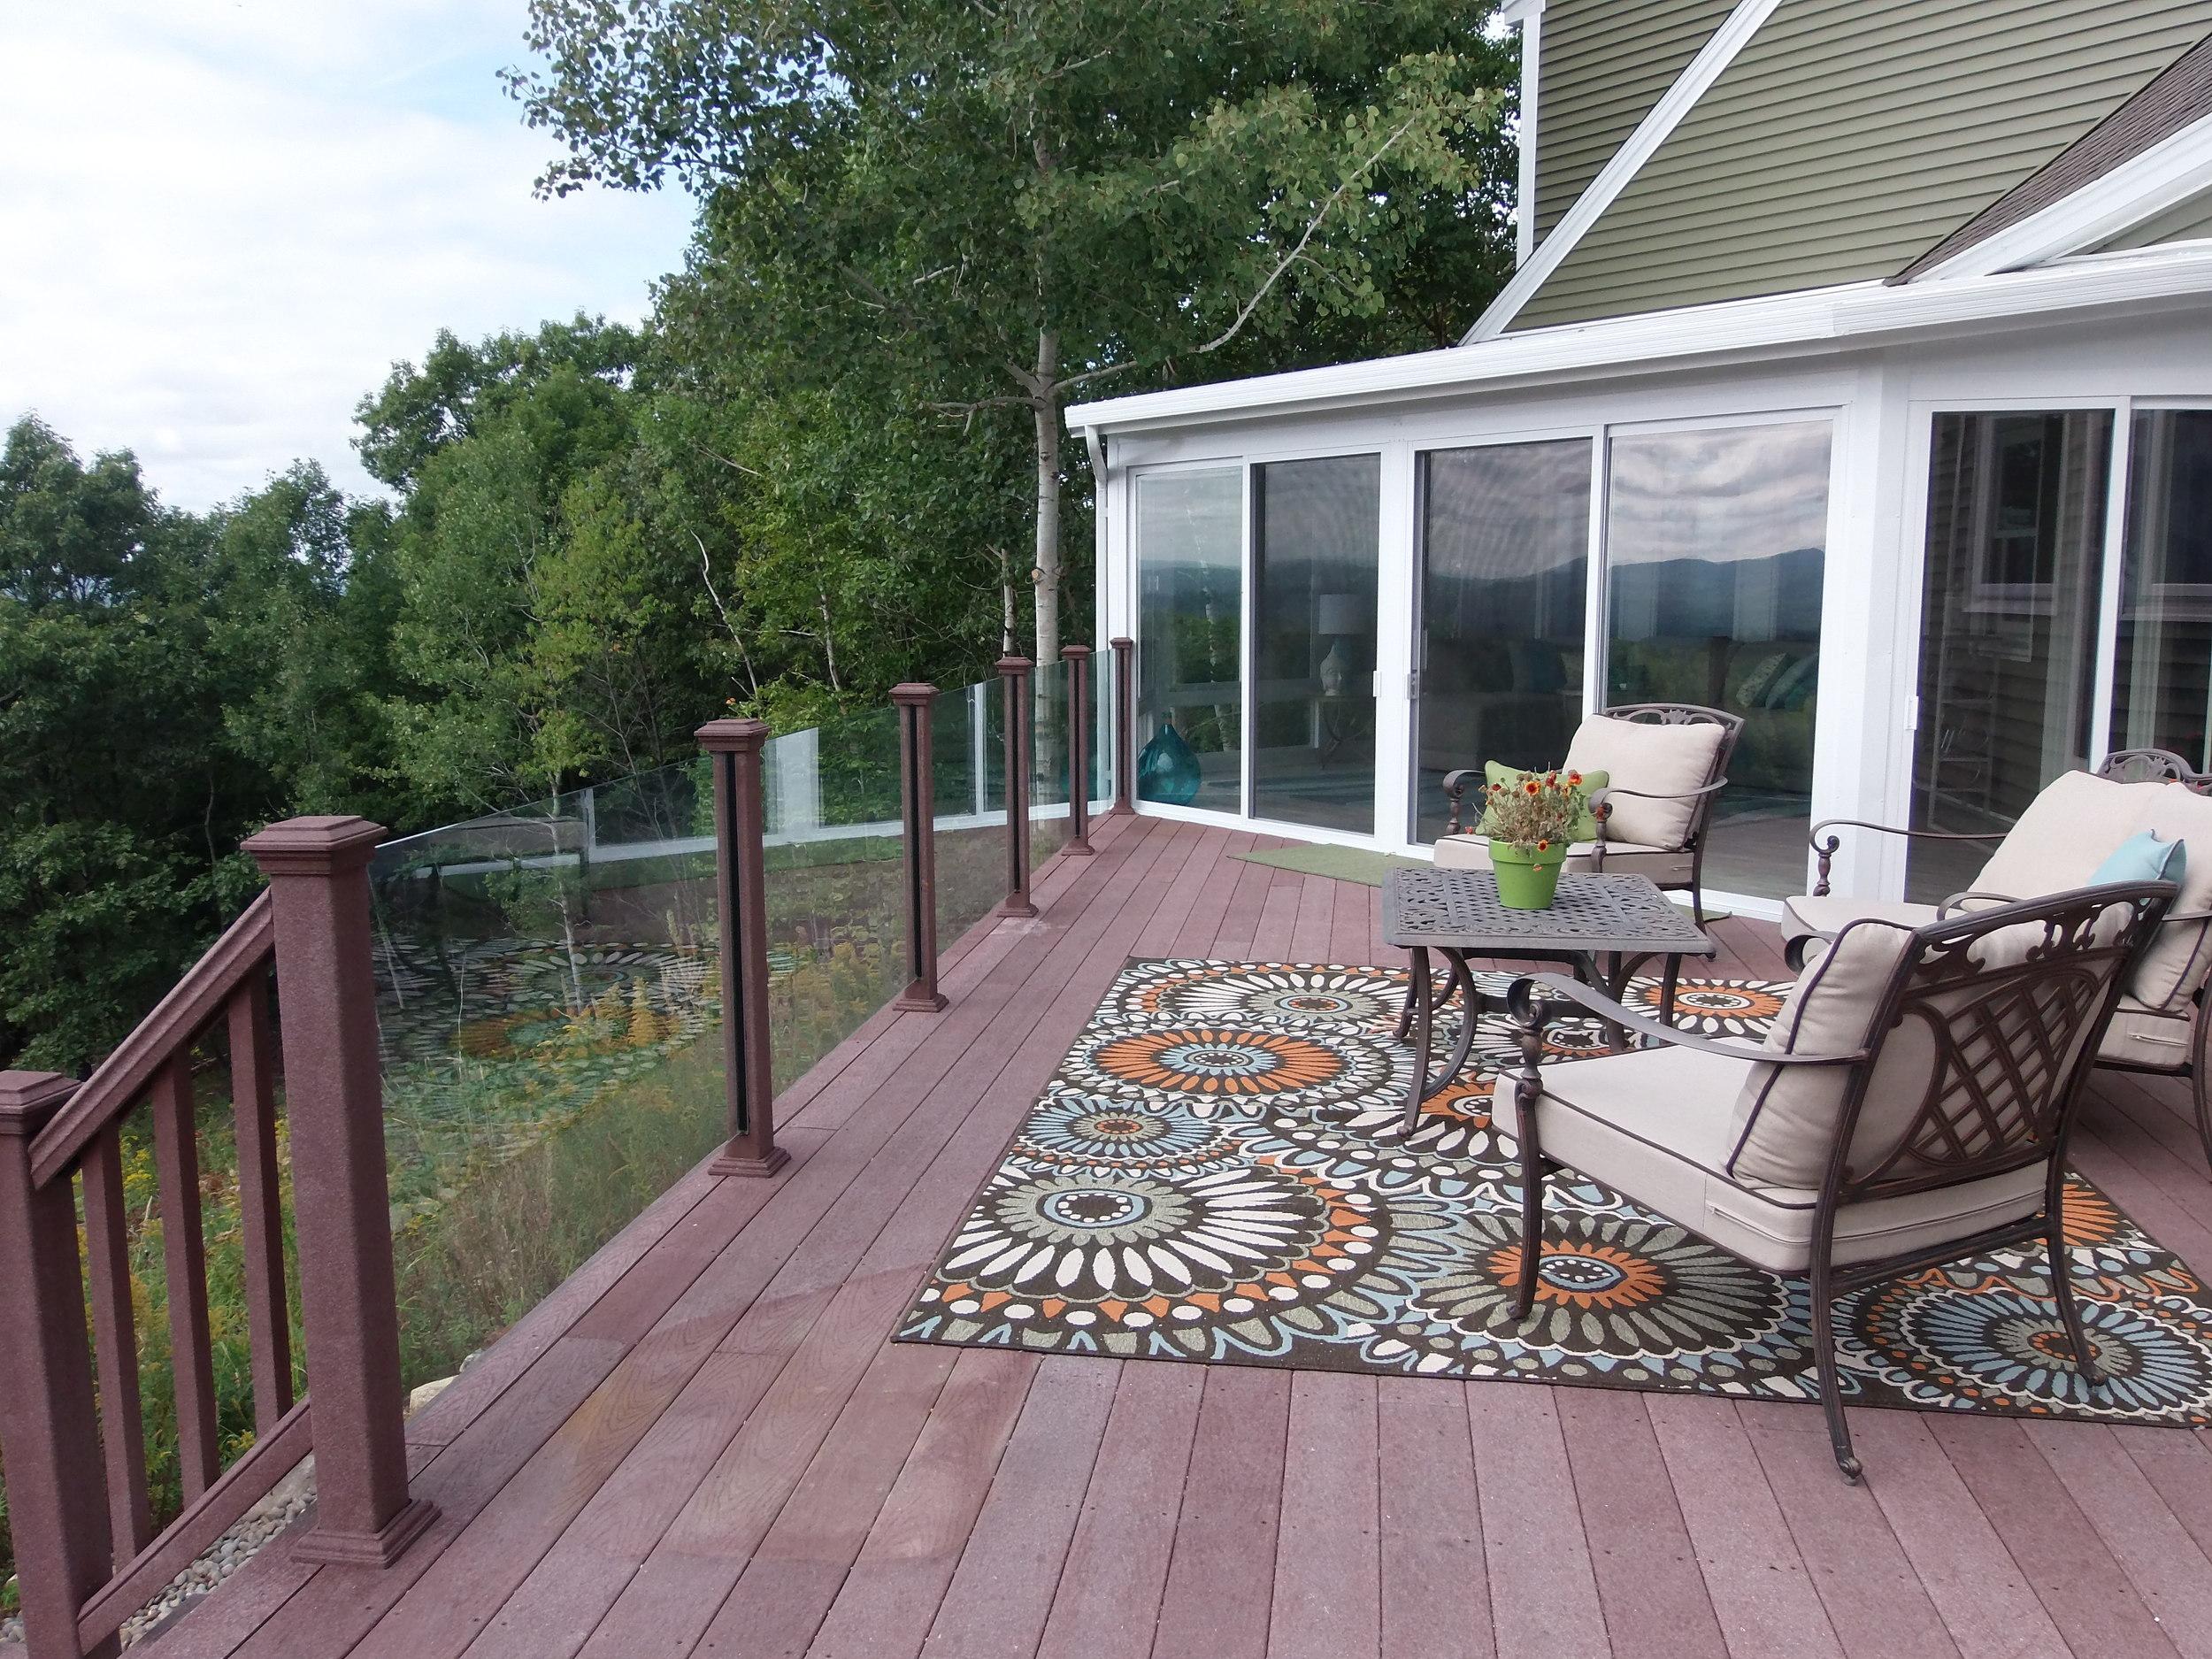 4-Season sunroom addition, New Boston, NH - Betterliving Sunrooms of NH